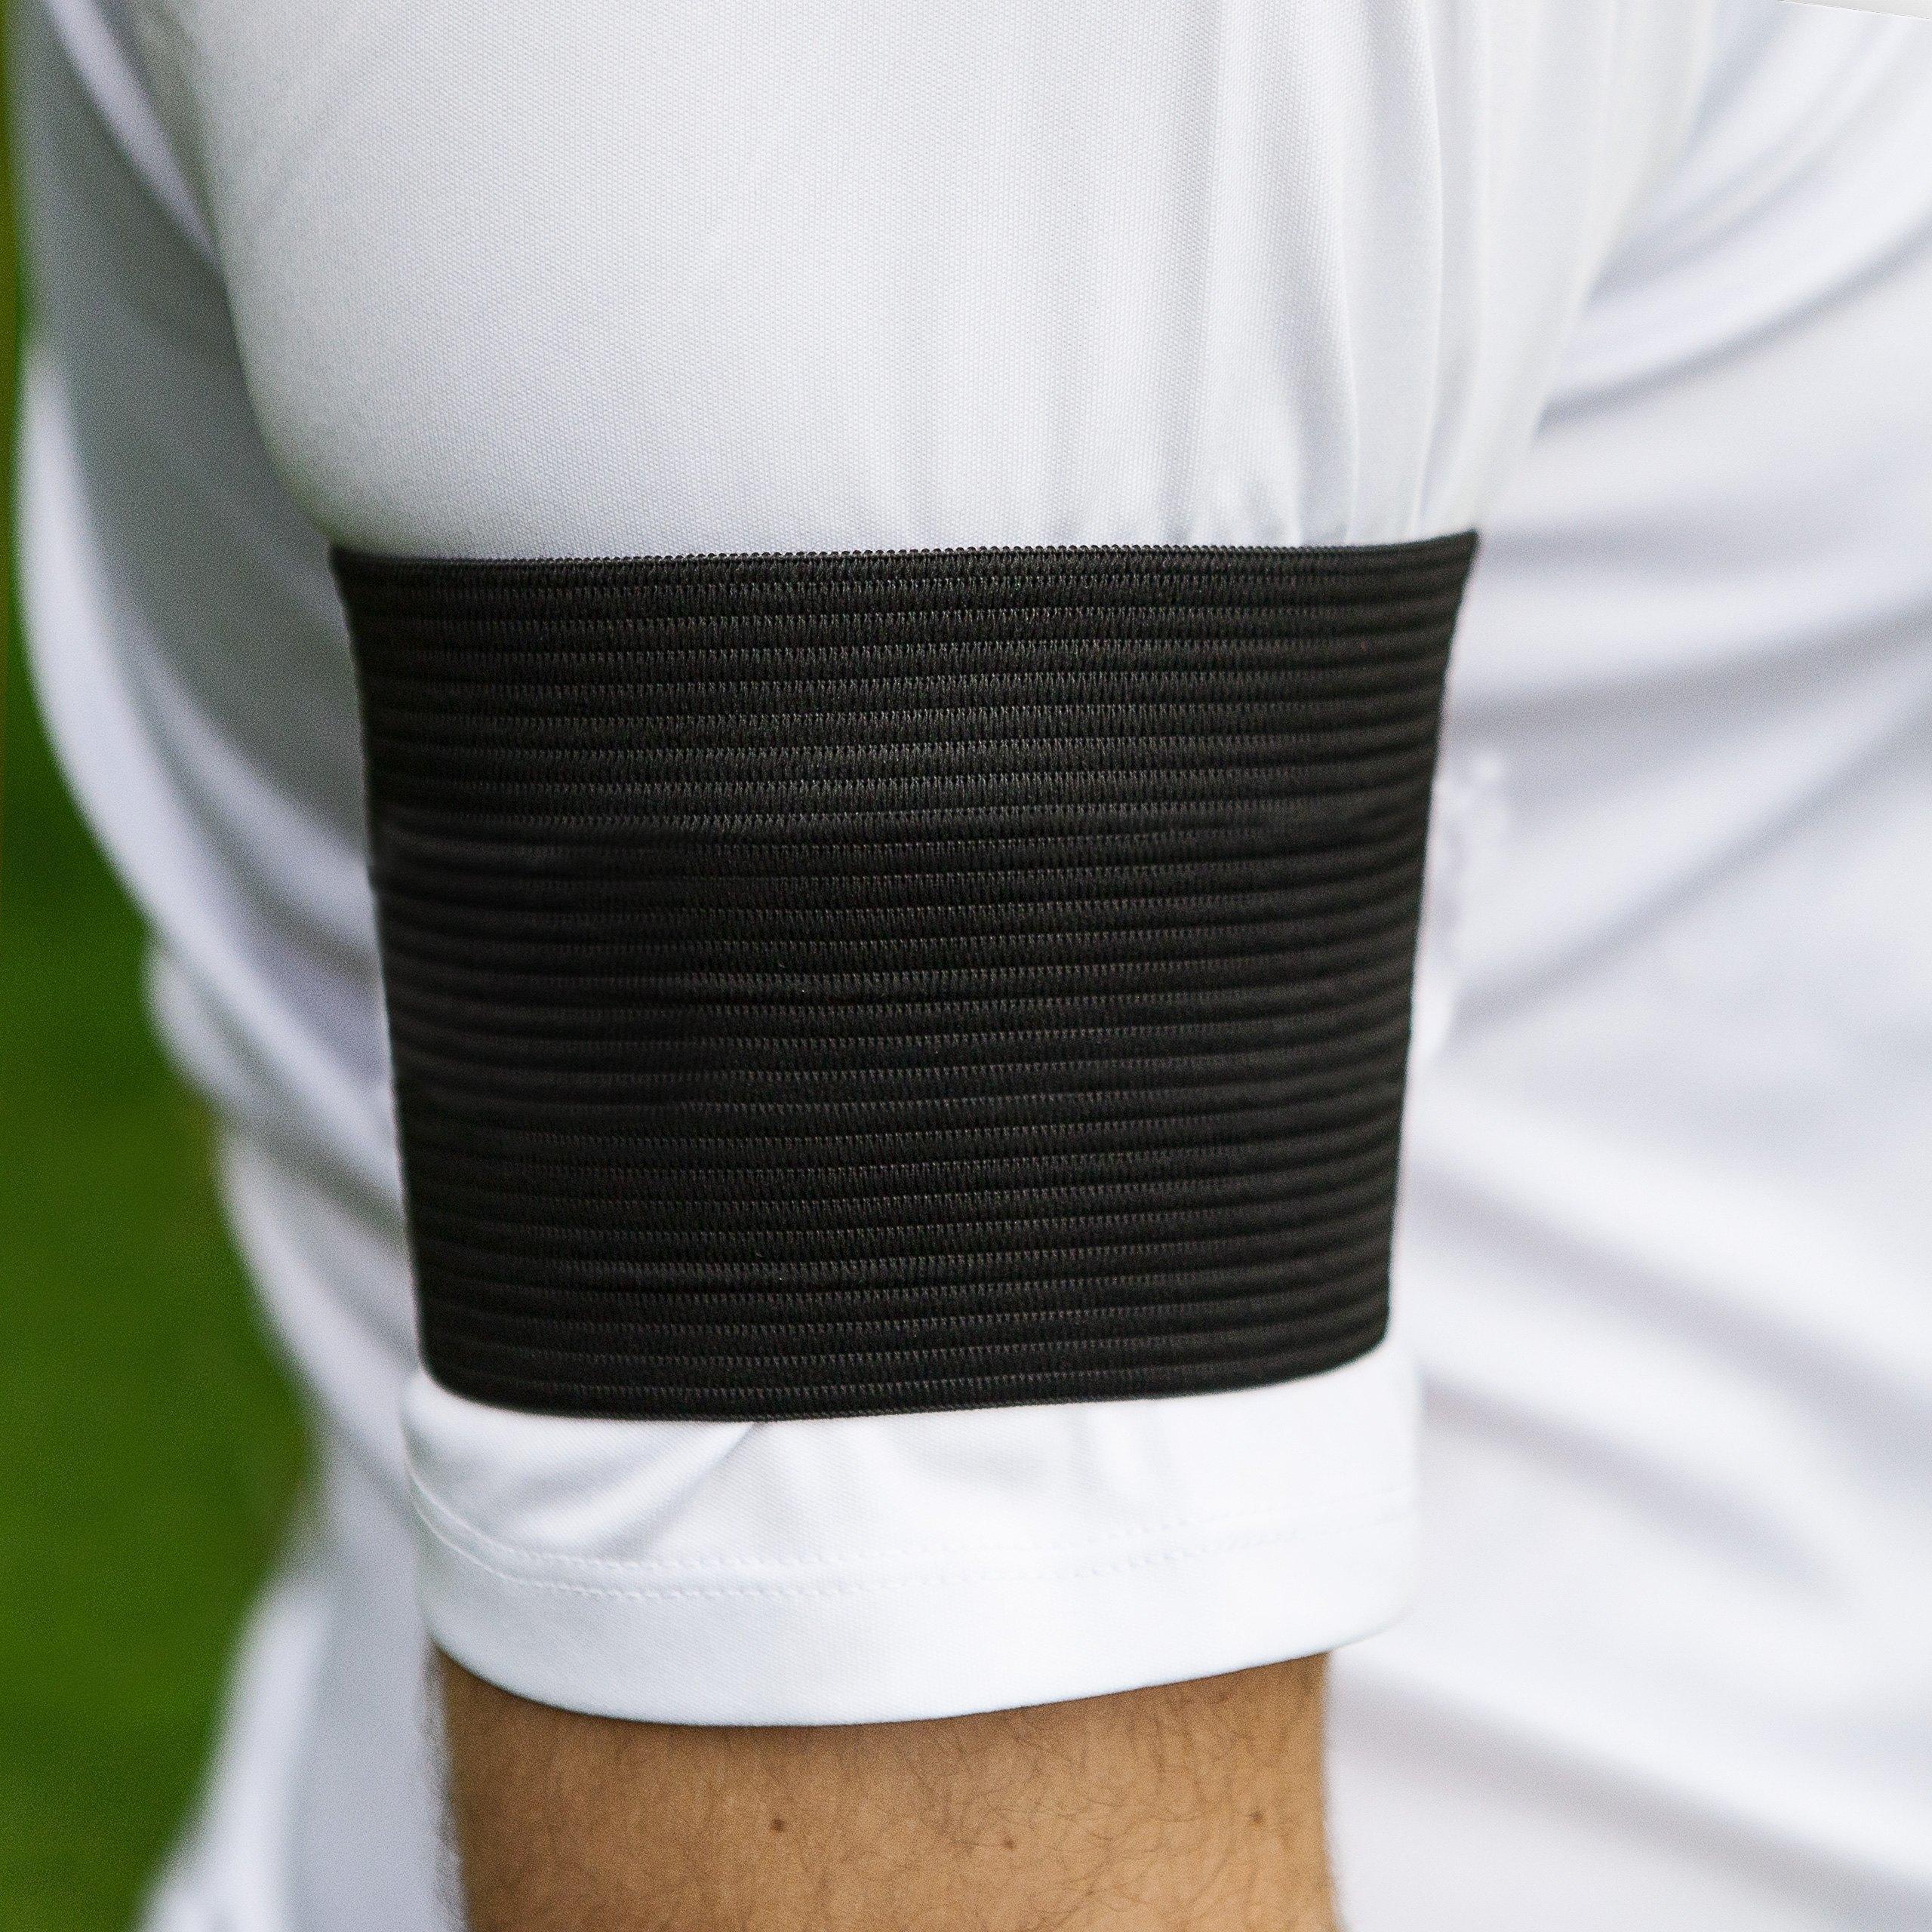 Black Armbands For Mourning Amp Memorial Net World Sports